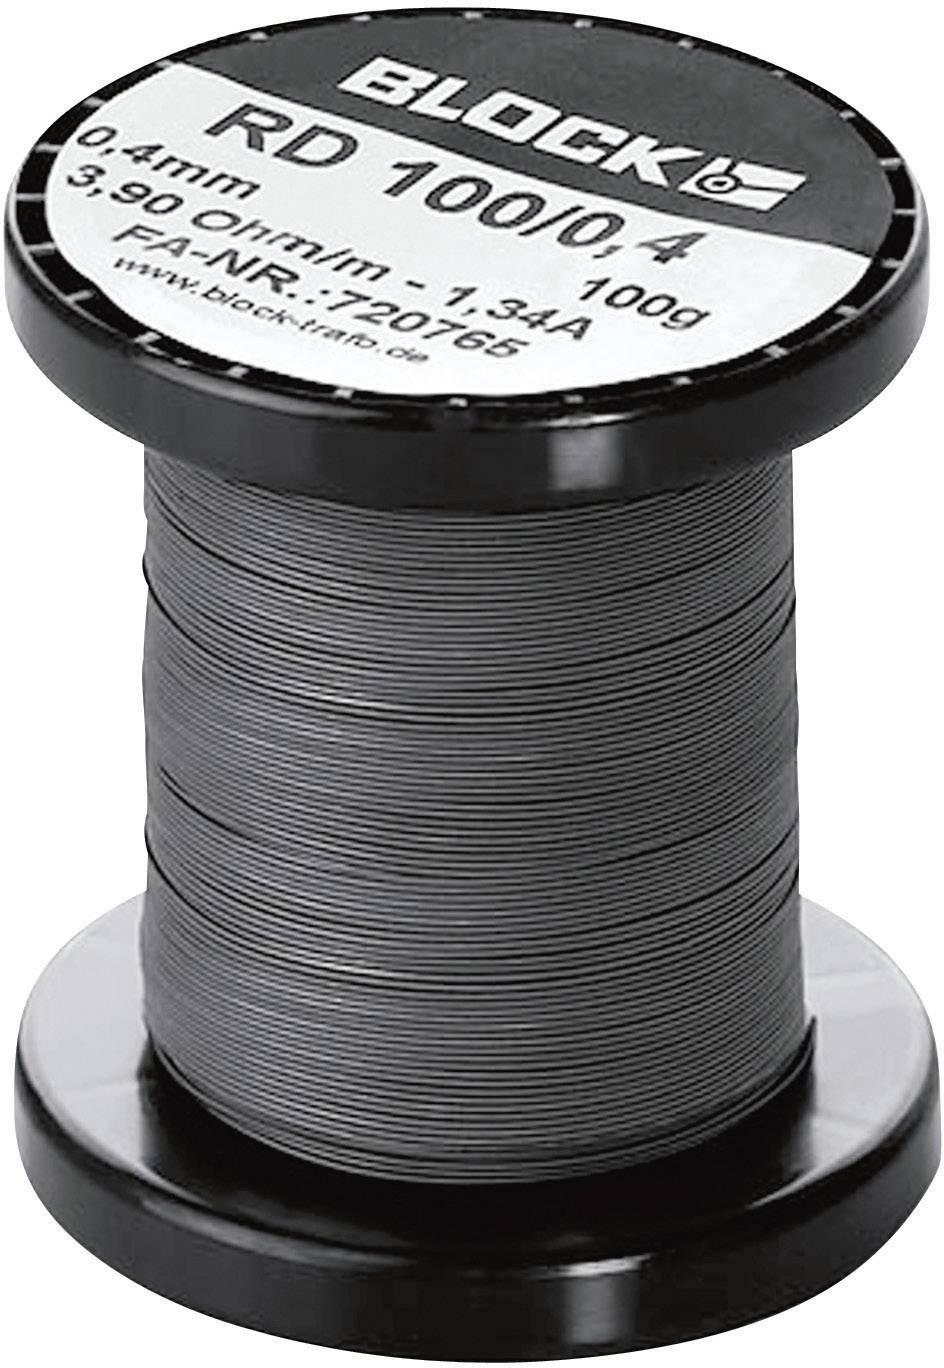 Odporový drát (konstantan) 62.4 Ω/m Block RD 100/0,1 1430 m